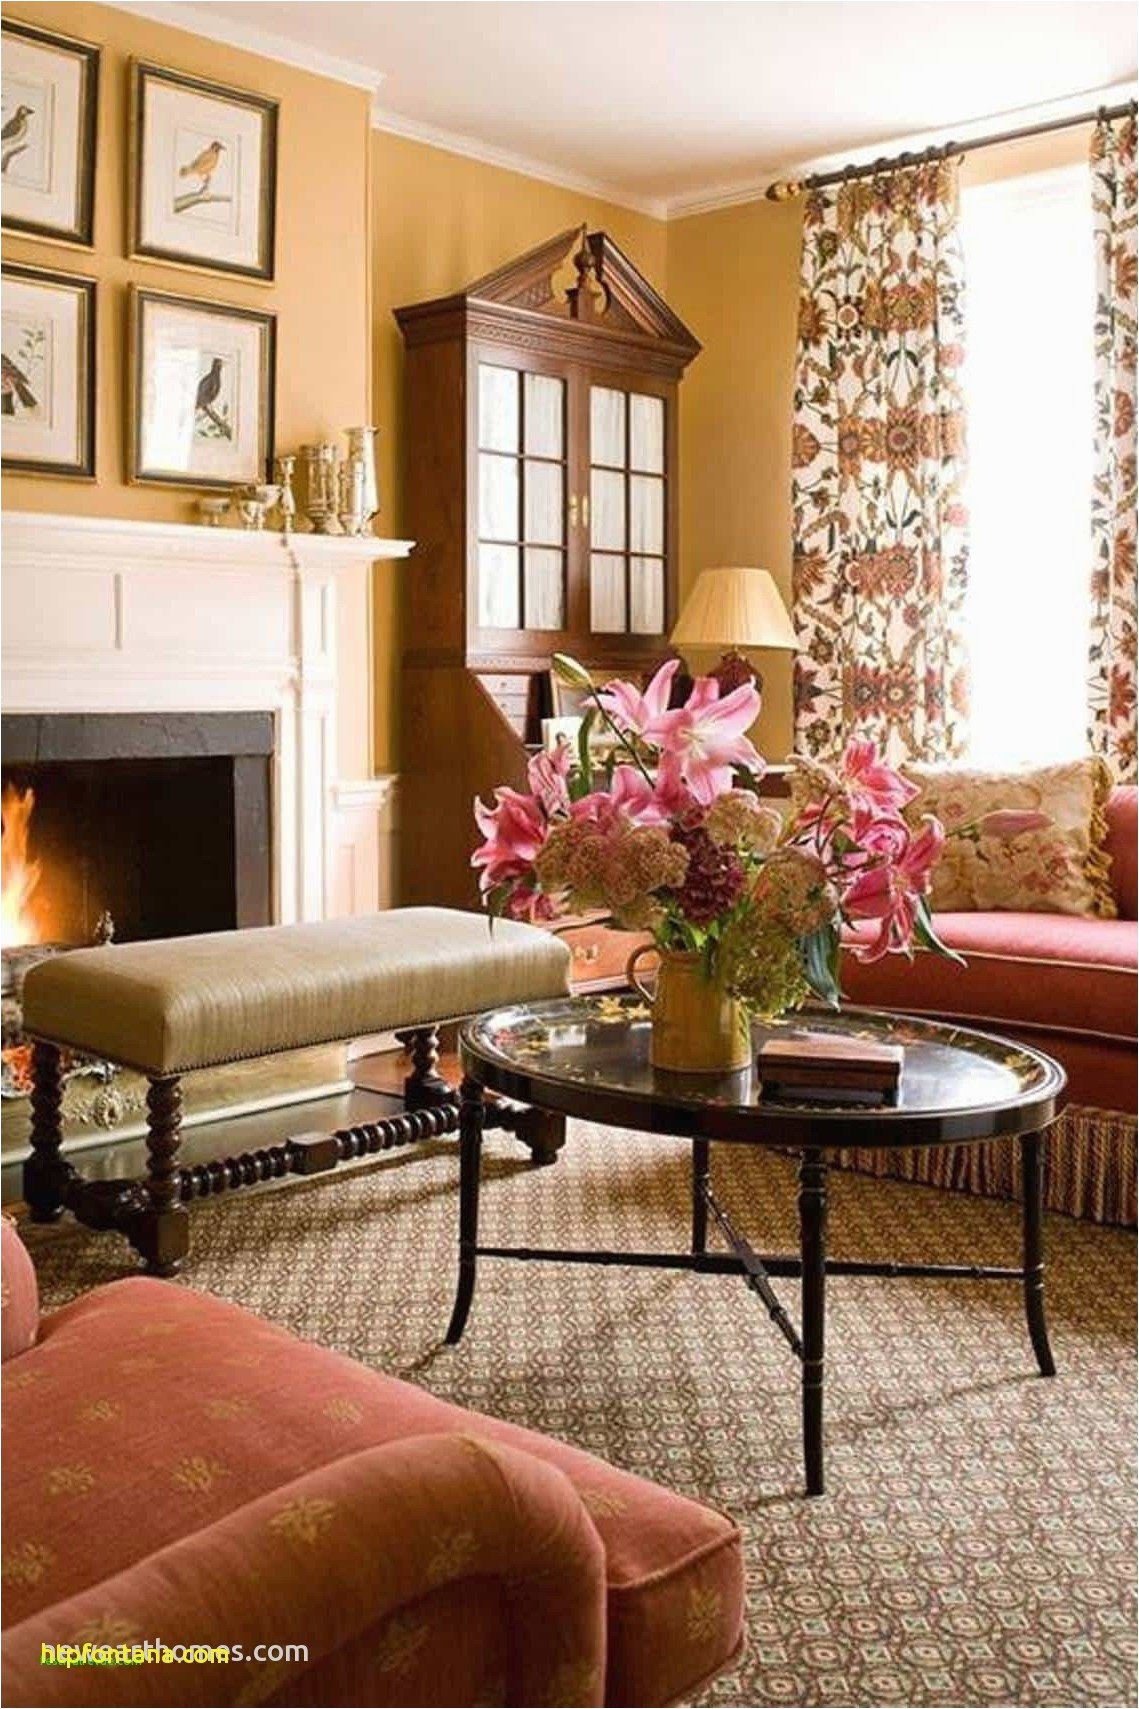 Alluring Blue Living Room Walls Inspirationa Modern Home Decor Ideas Alluring Media Cache Ec0 Pinimg 736x Cd 0d